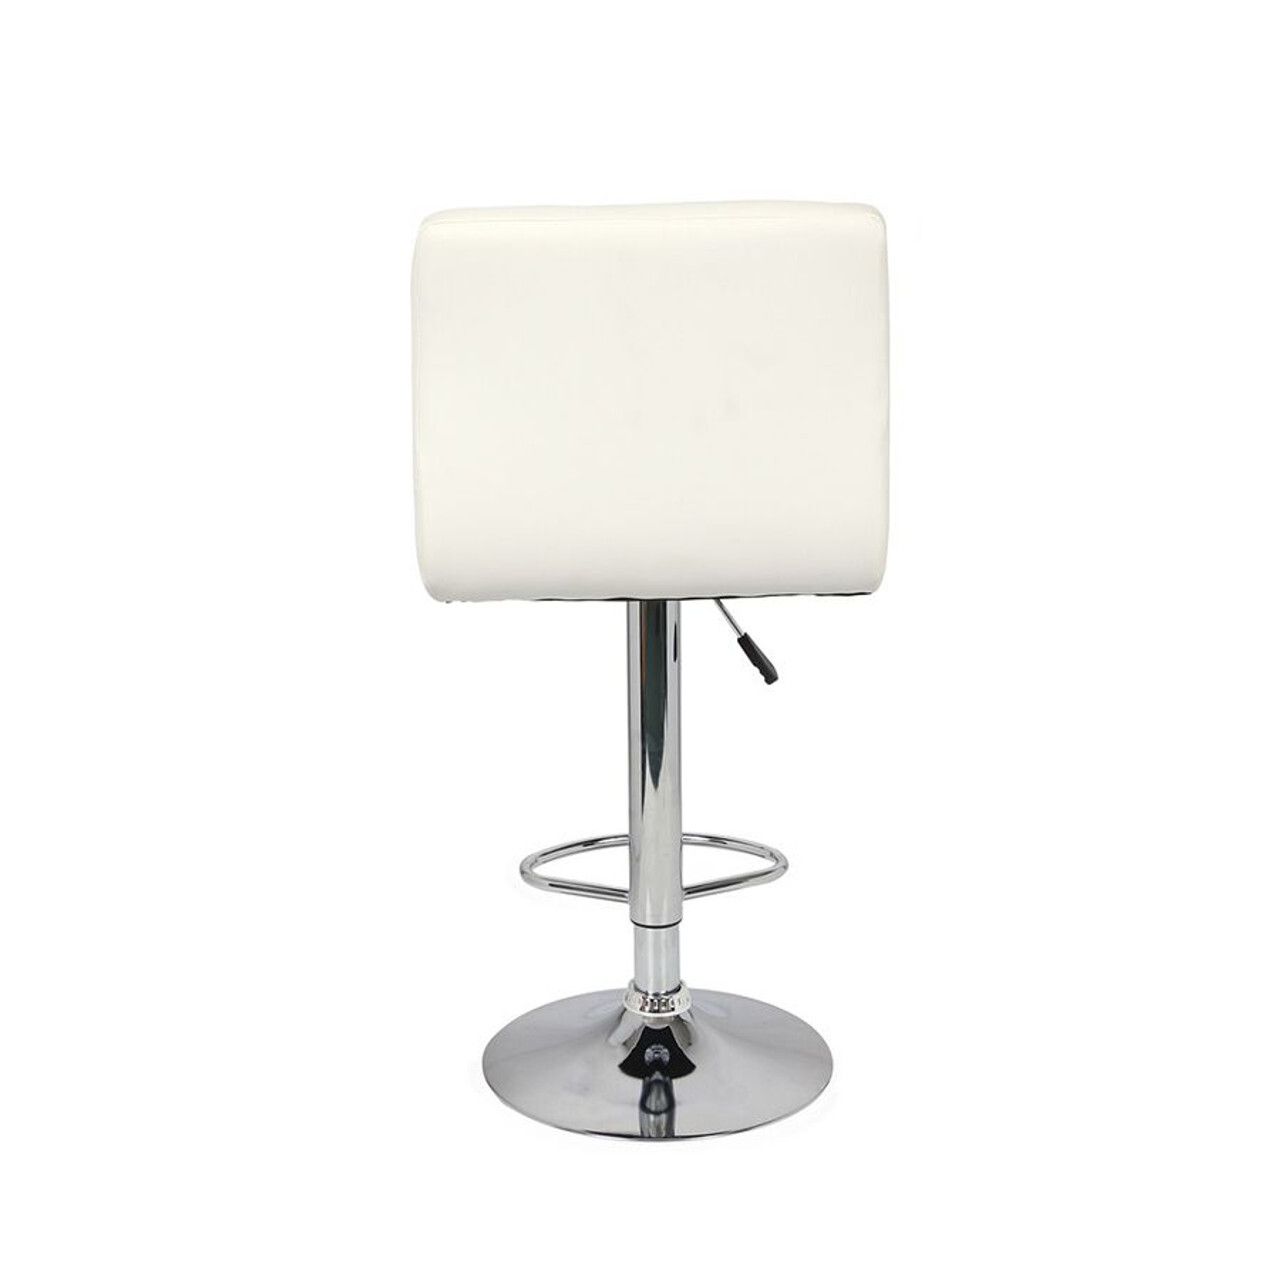 Set of 2 Adjustable Swivel Bar Stools  White Color